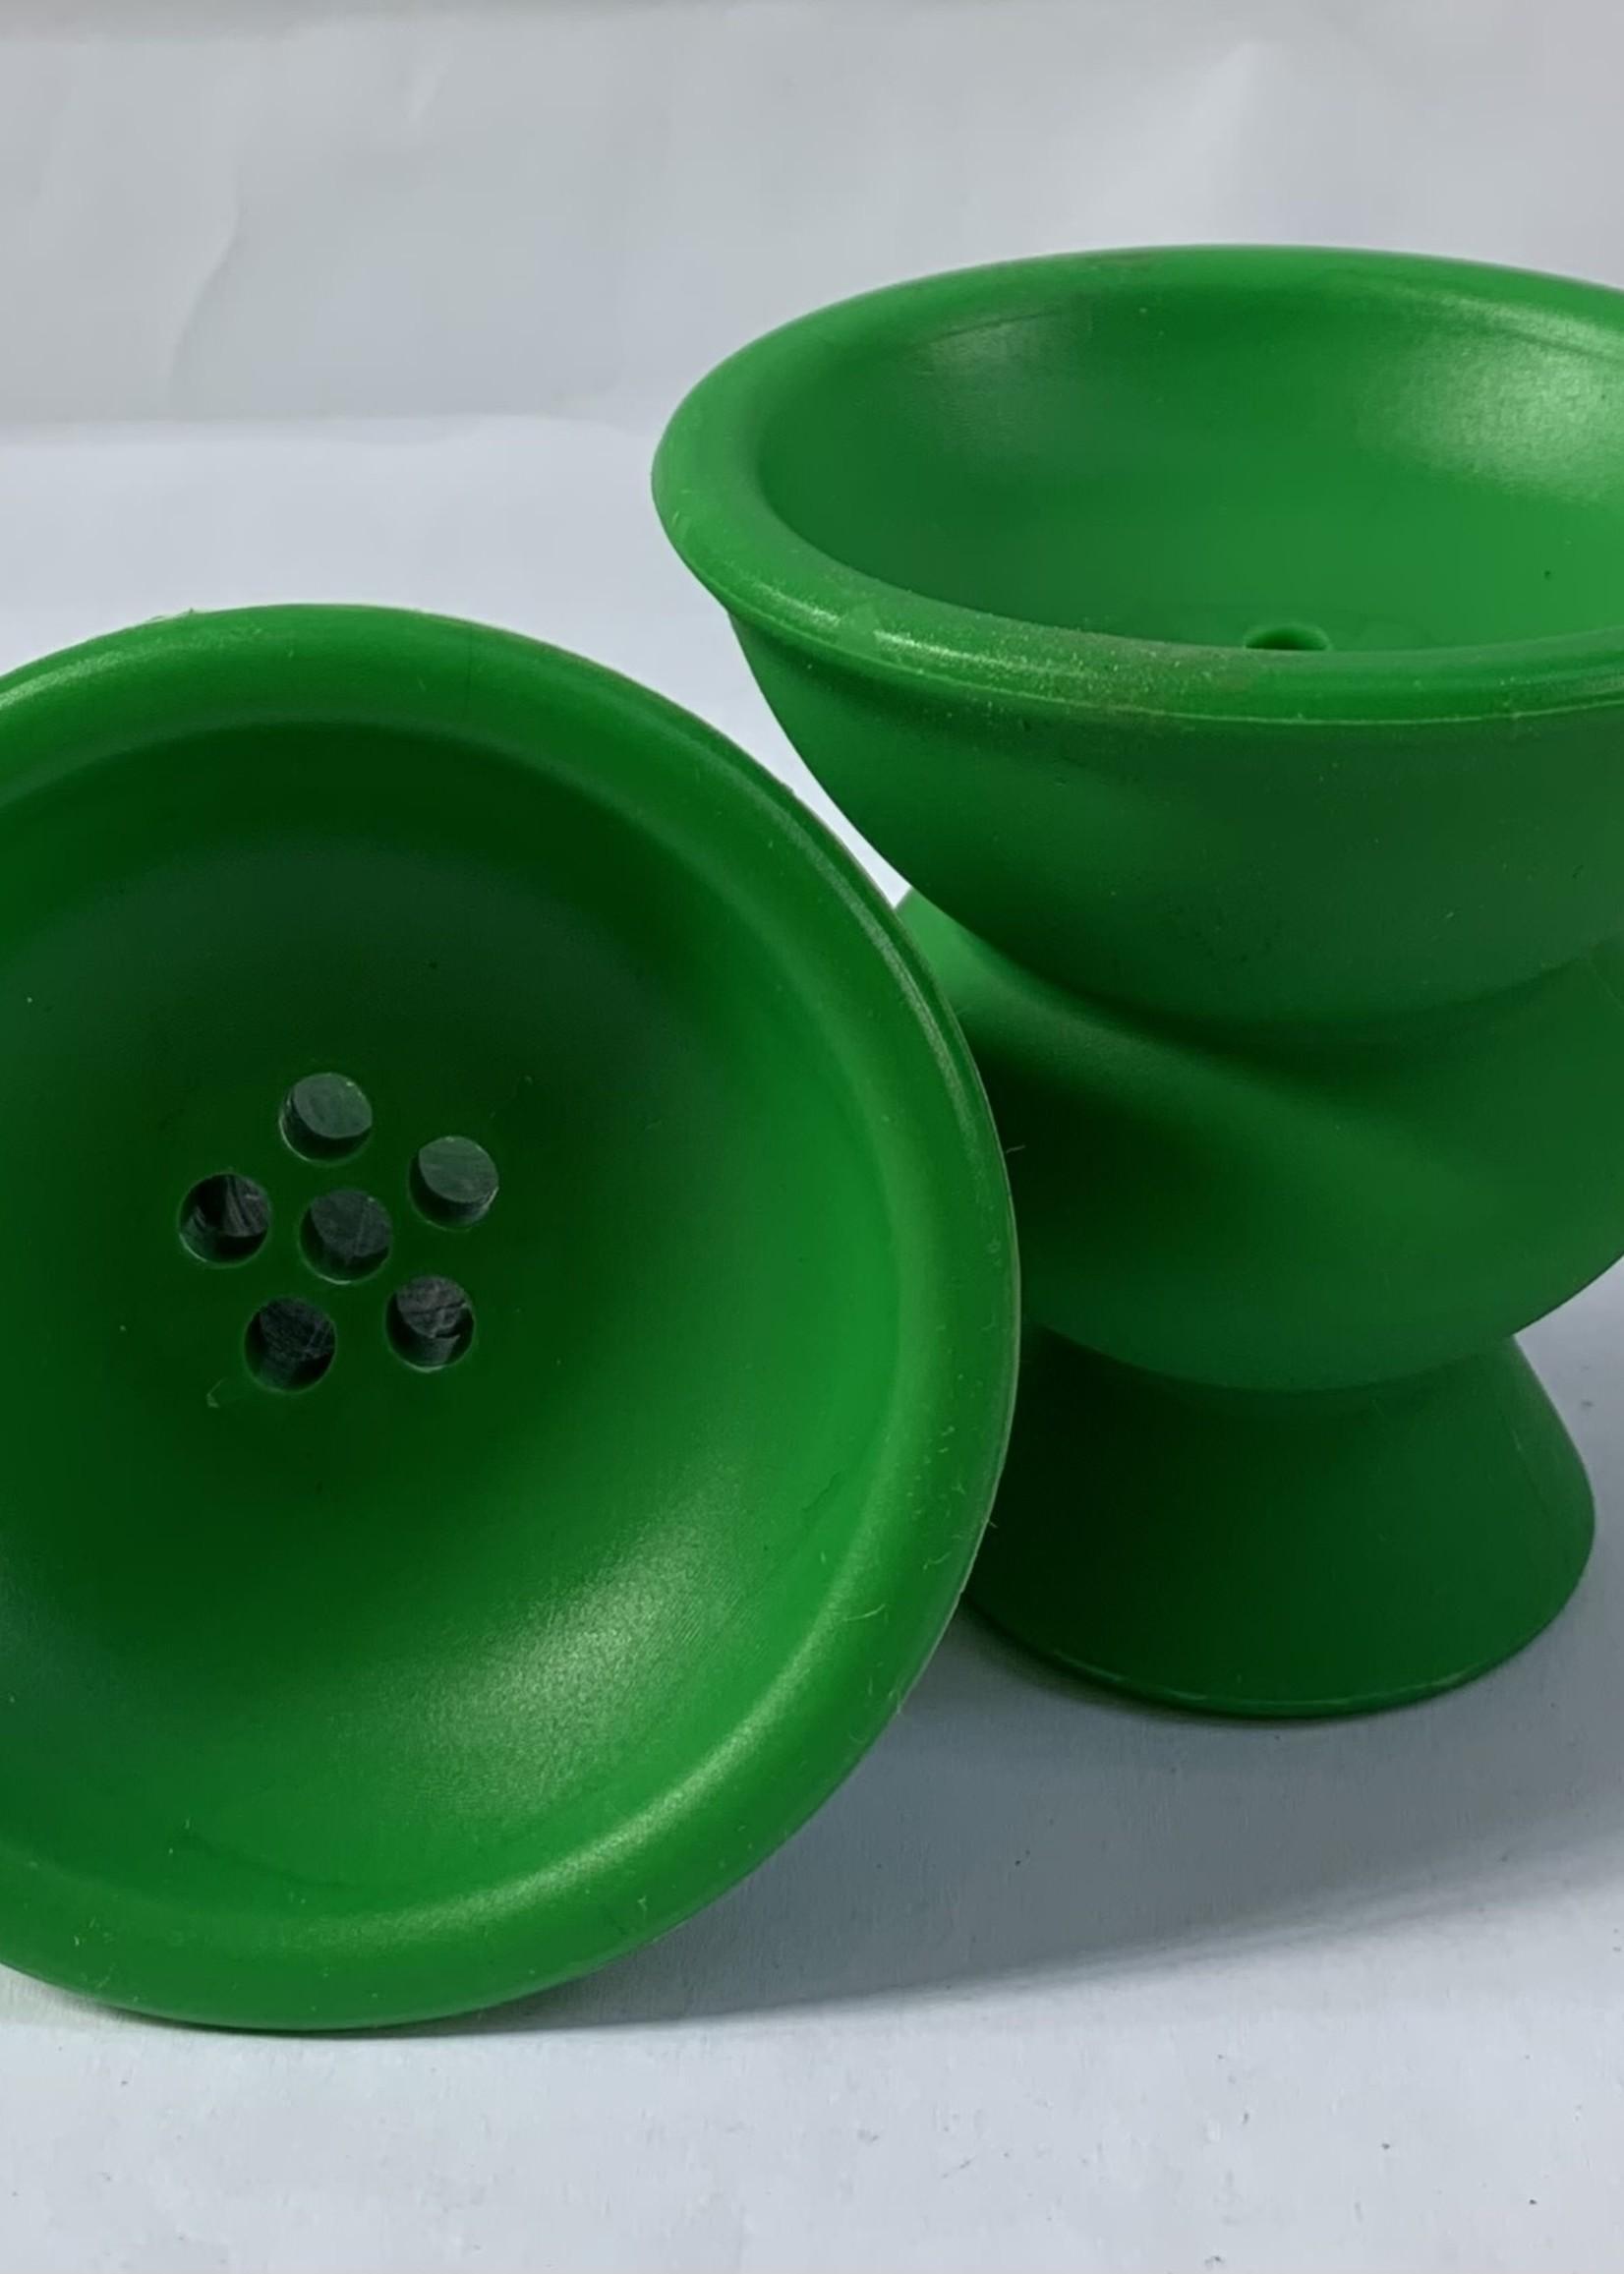 Silicon head - green